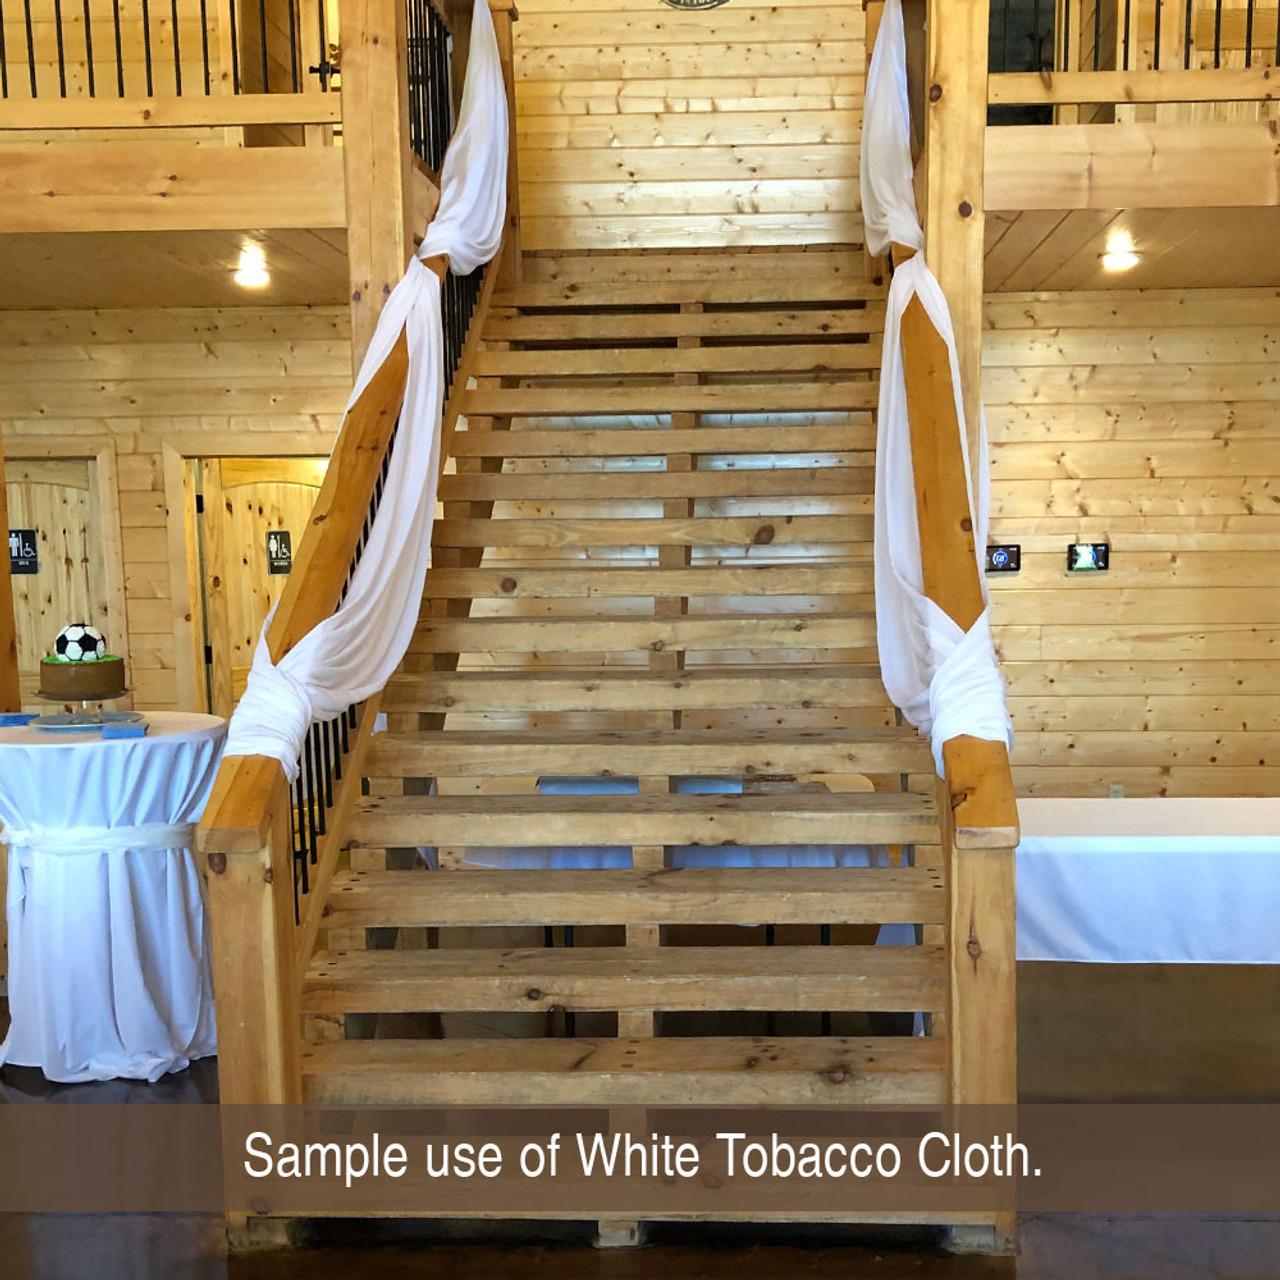 True White Tobacco Cloth Cotton Fabric - Lightweight